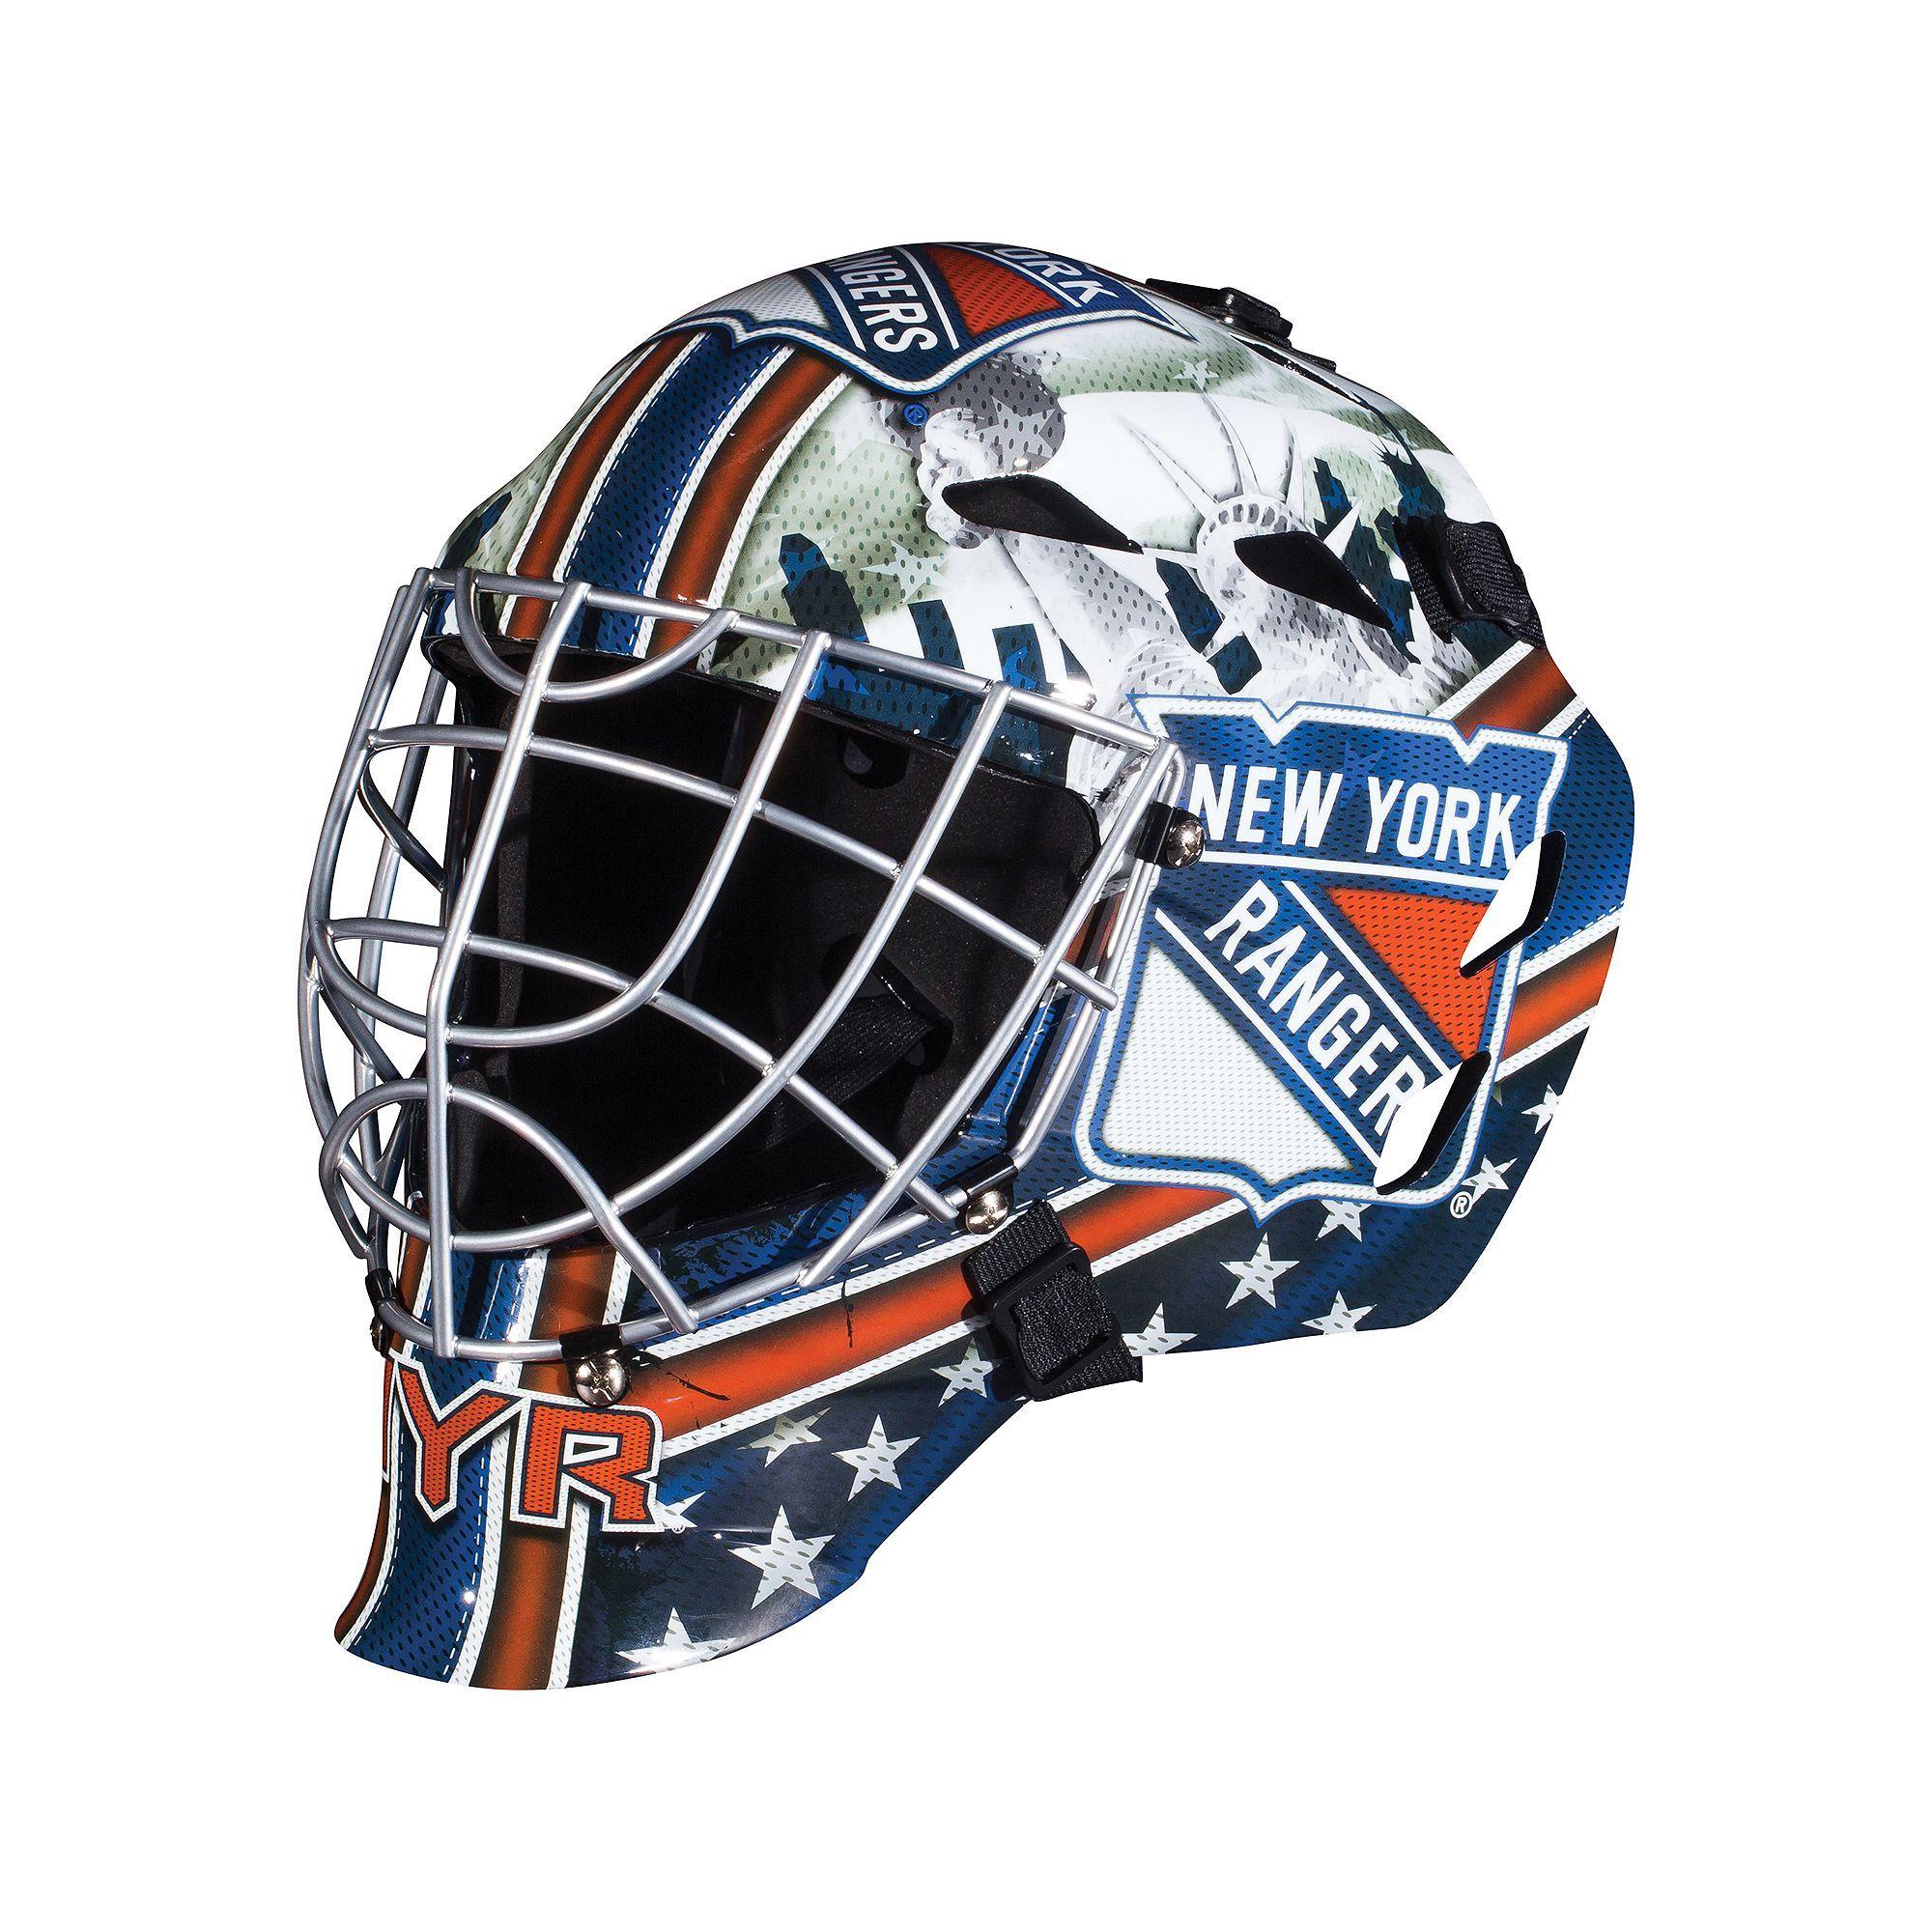 Franklin Youth New York Rangers Gfm 1500 Street Hockey Goalie Face Mask Multicolor New York Rangers Street Hockey Franklin Sports